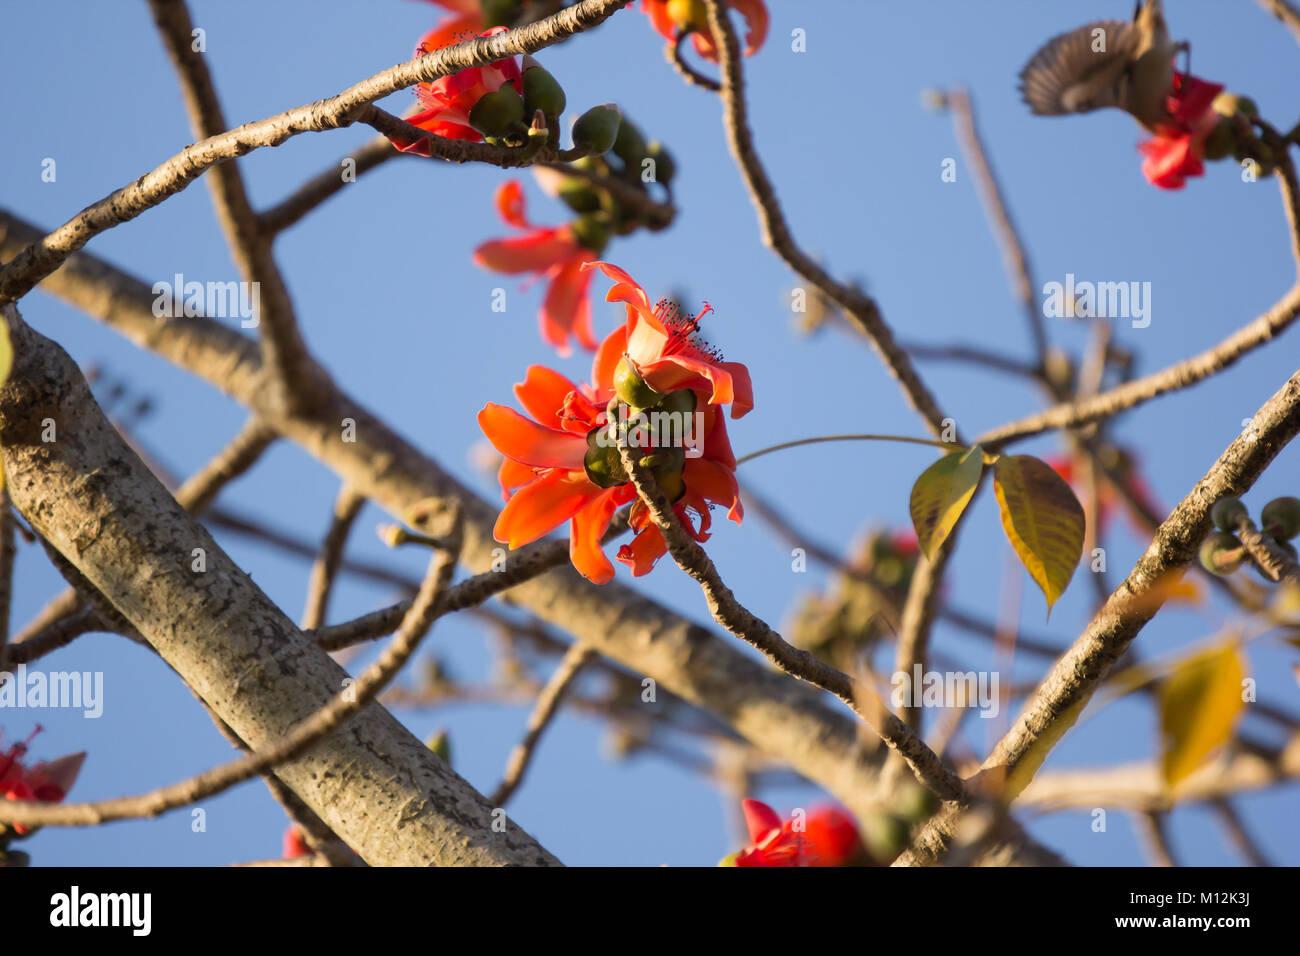 Flower of Bombax ceiba tree with blue sky background Stock Photo